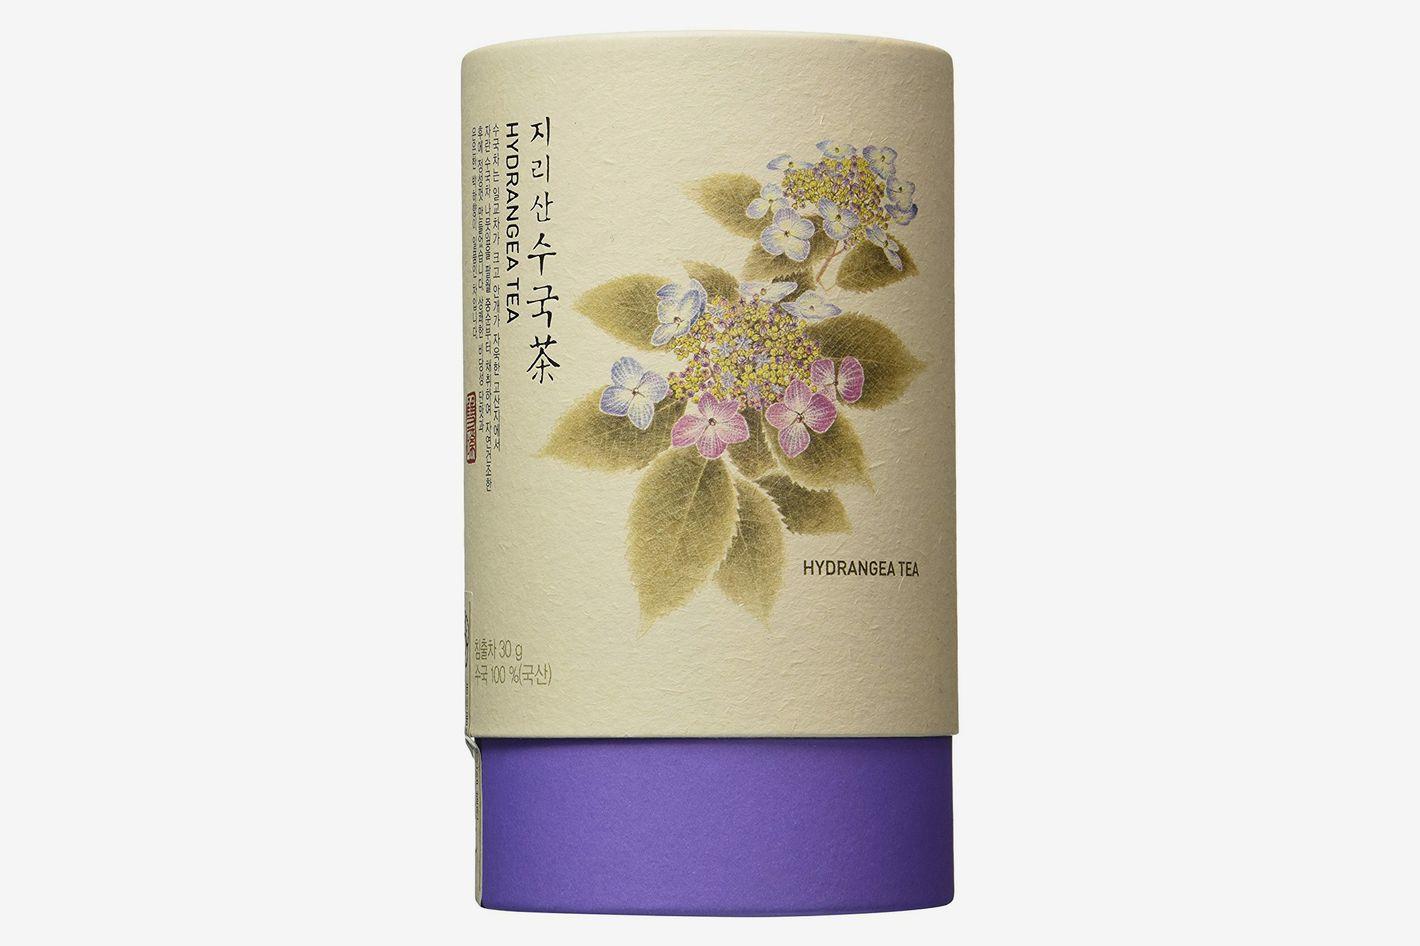 Korean Sweet Hydrangea Leaf Tea